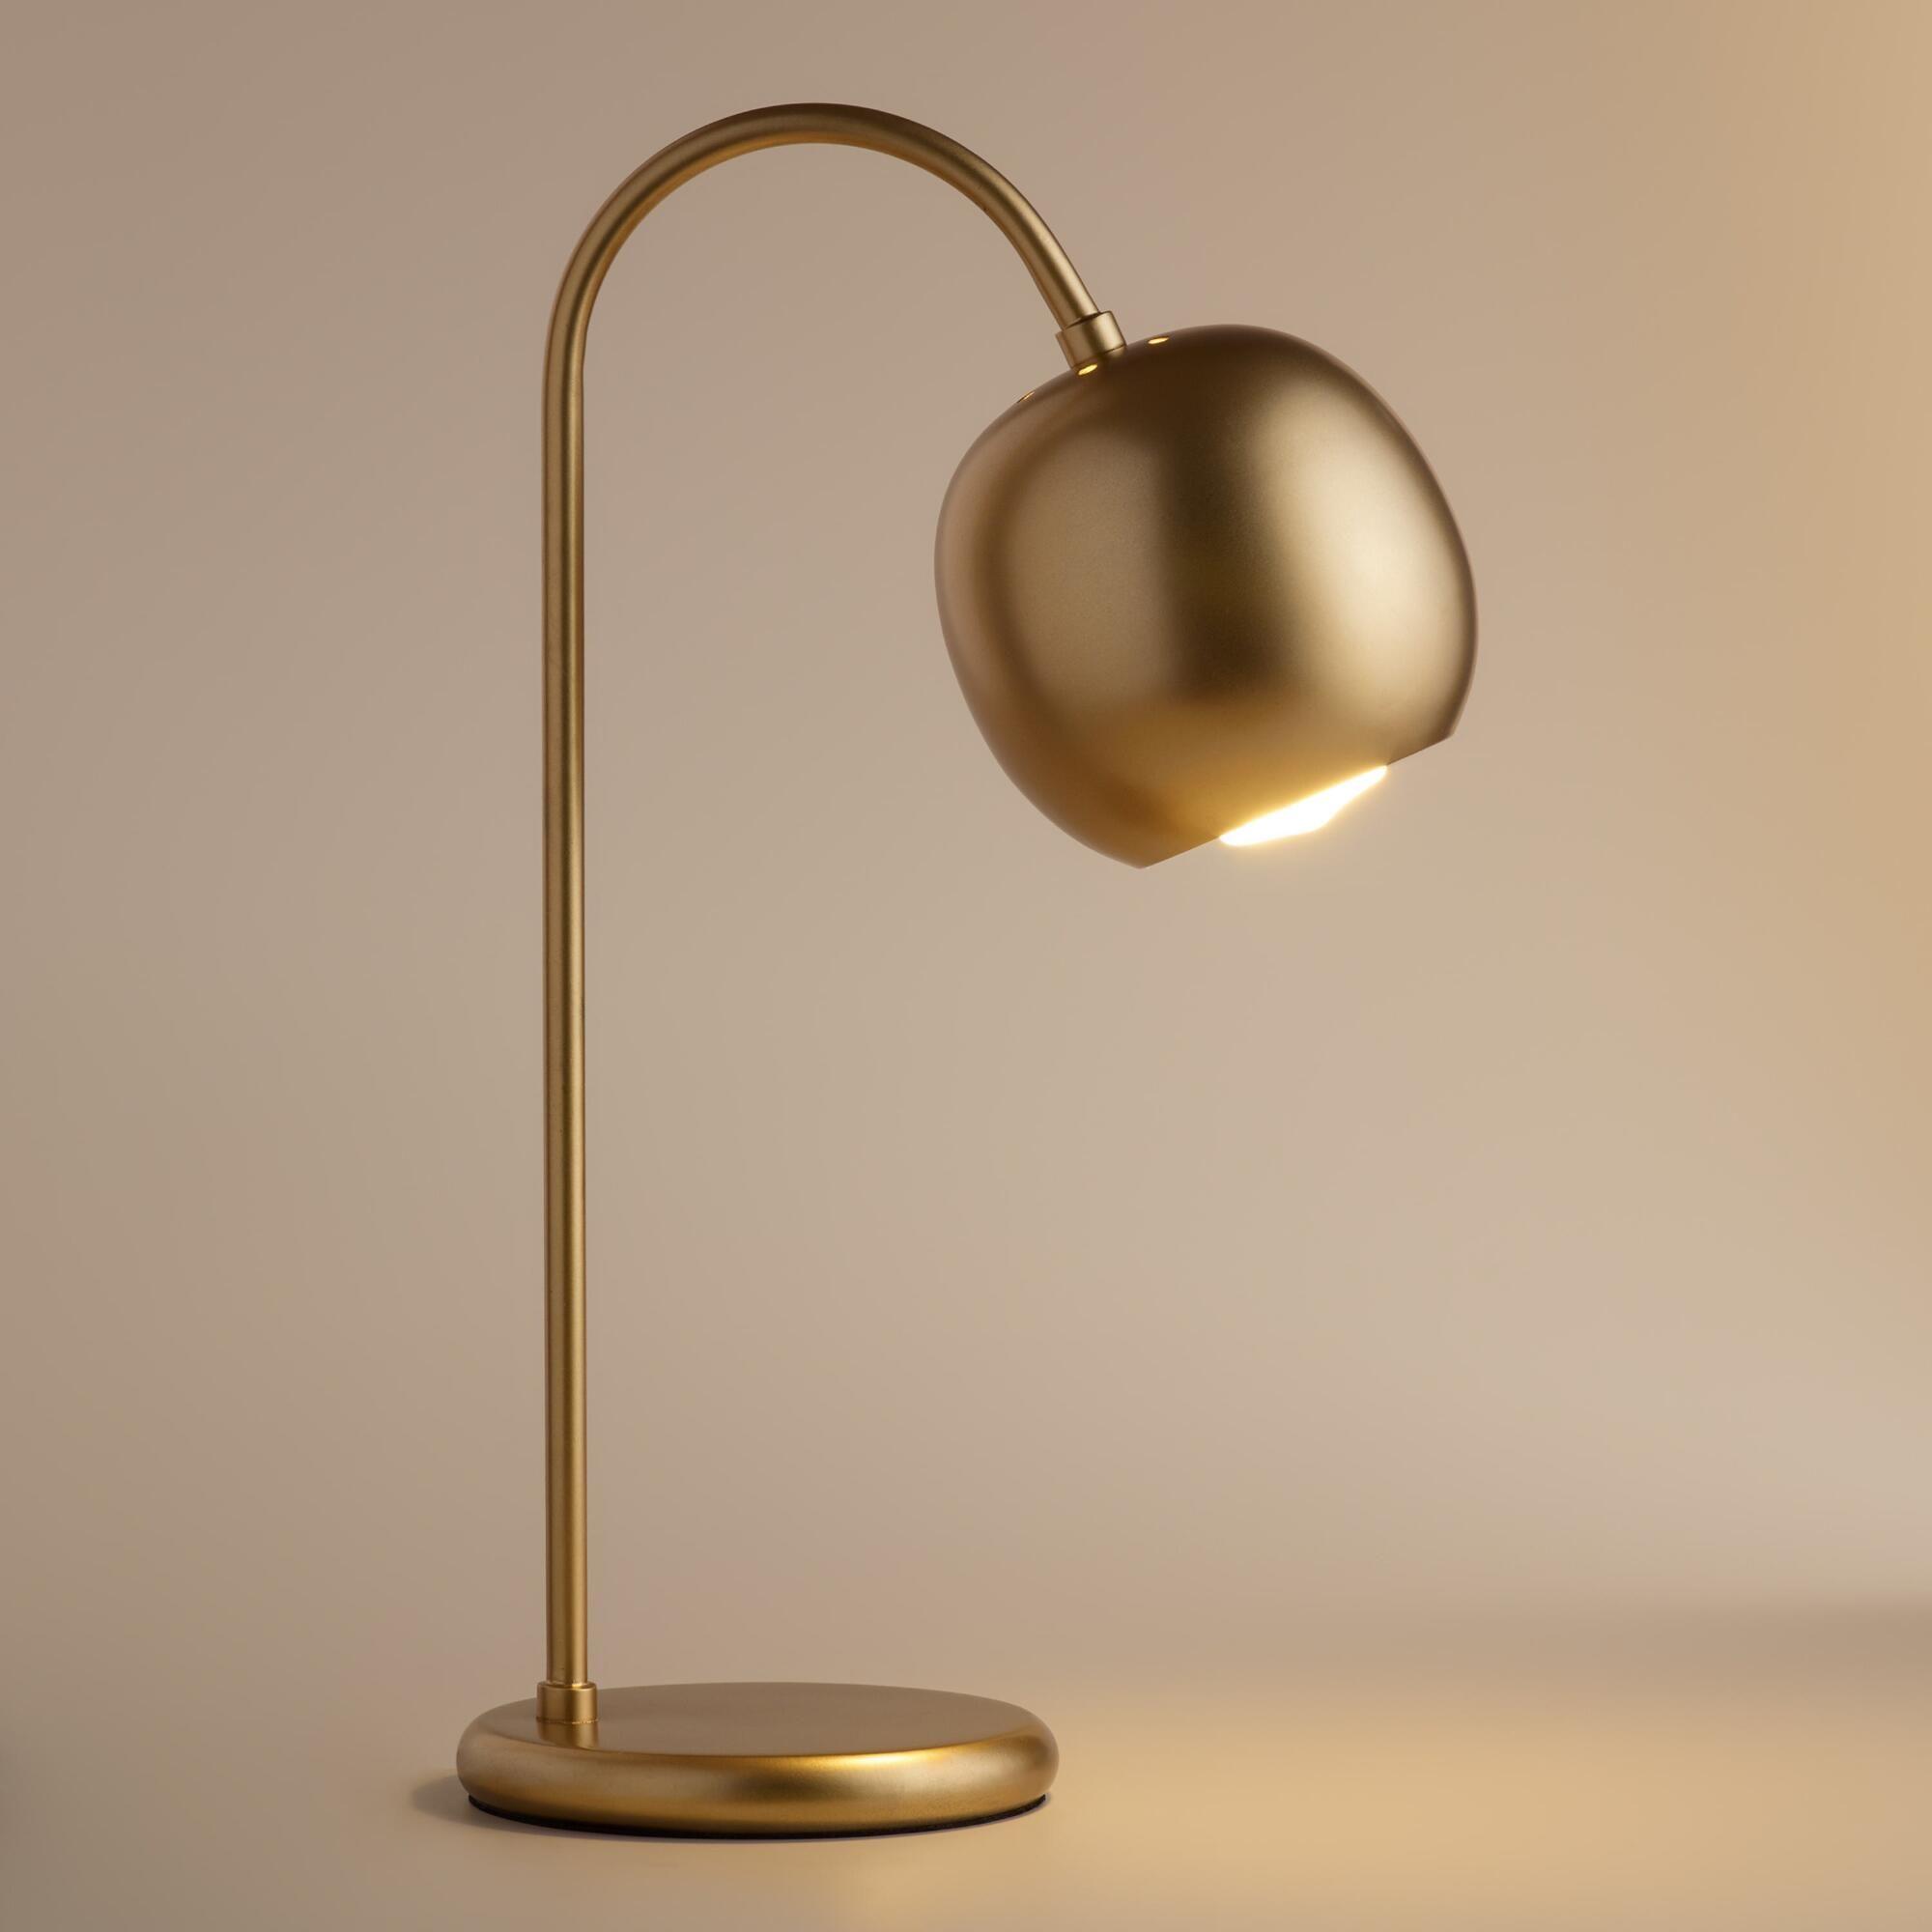 Antique Gold Scoop Desk Lamp